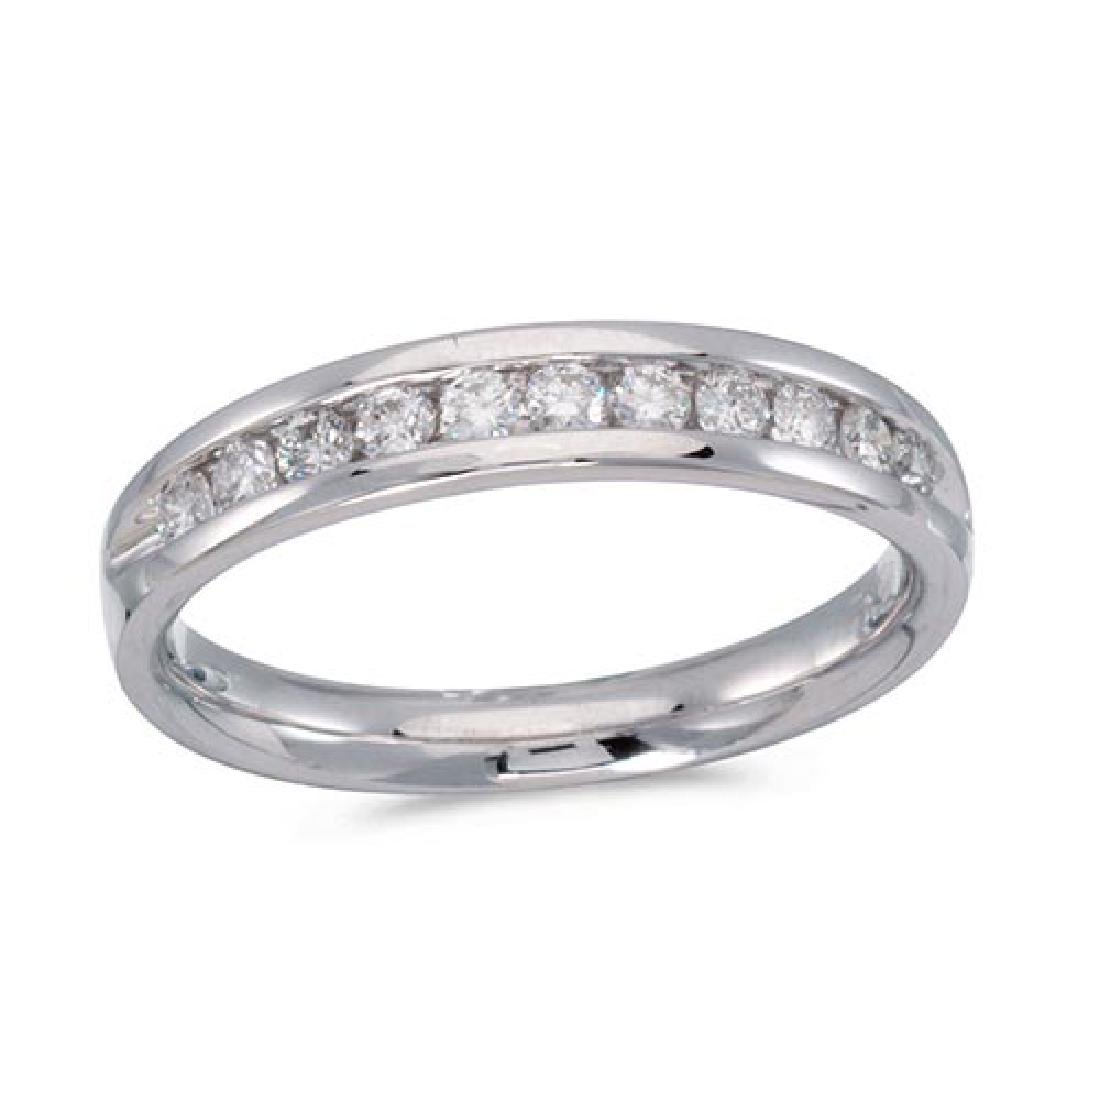 Certified 14K White Gold Diamond Diamond Band Ring 0.33